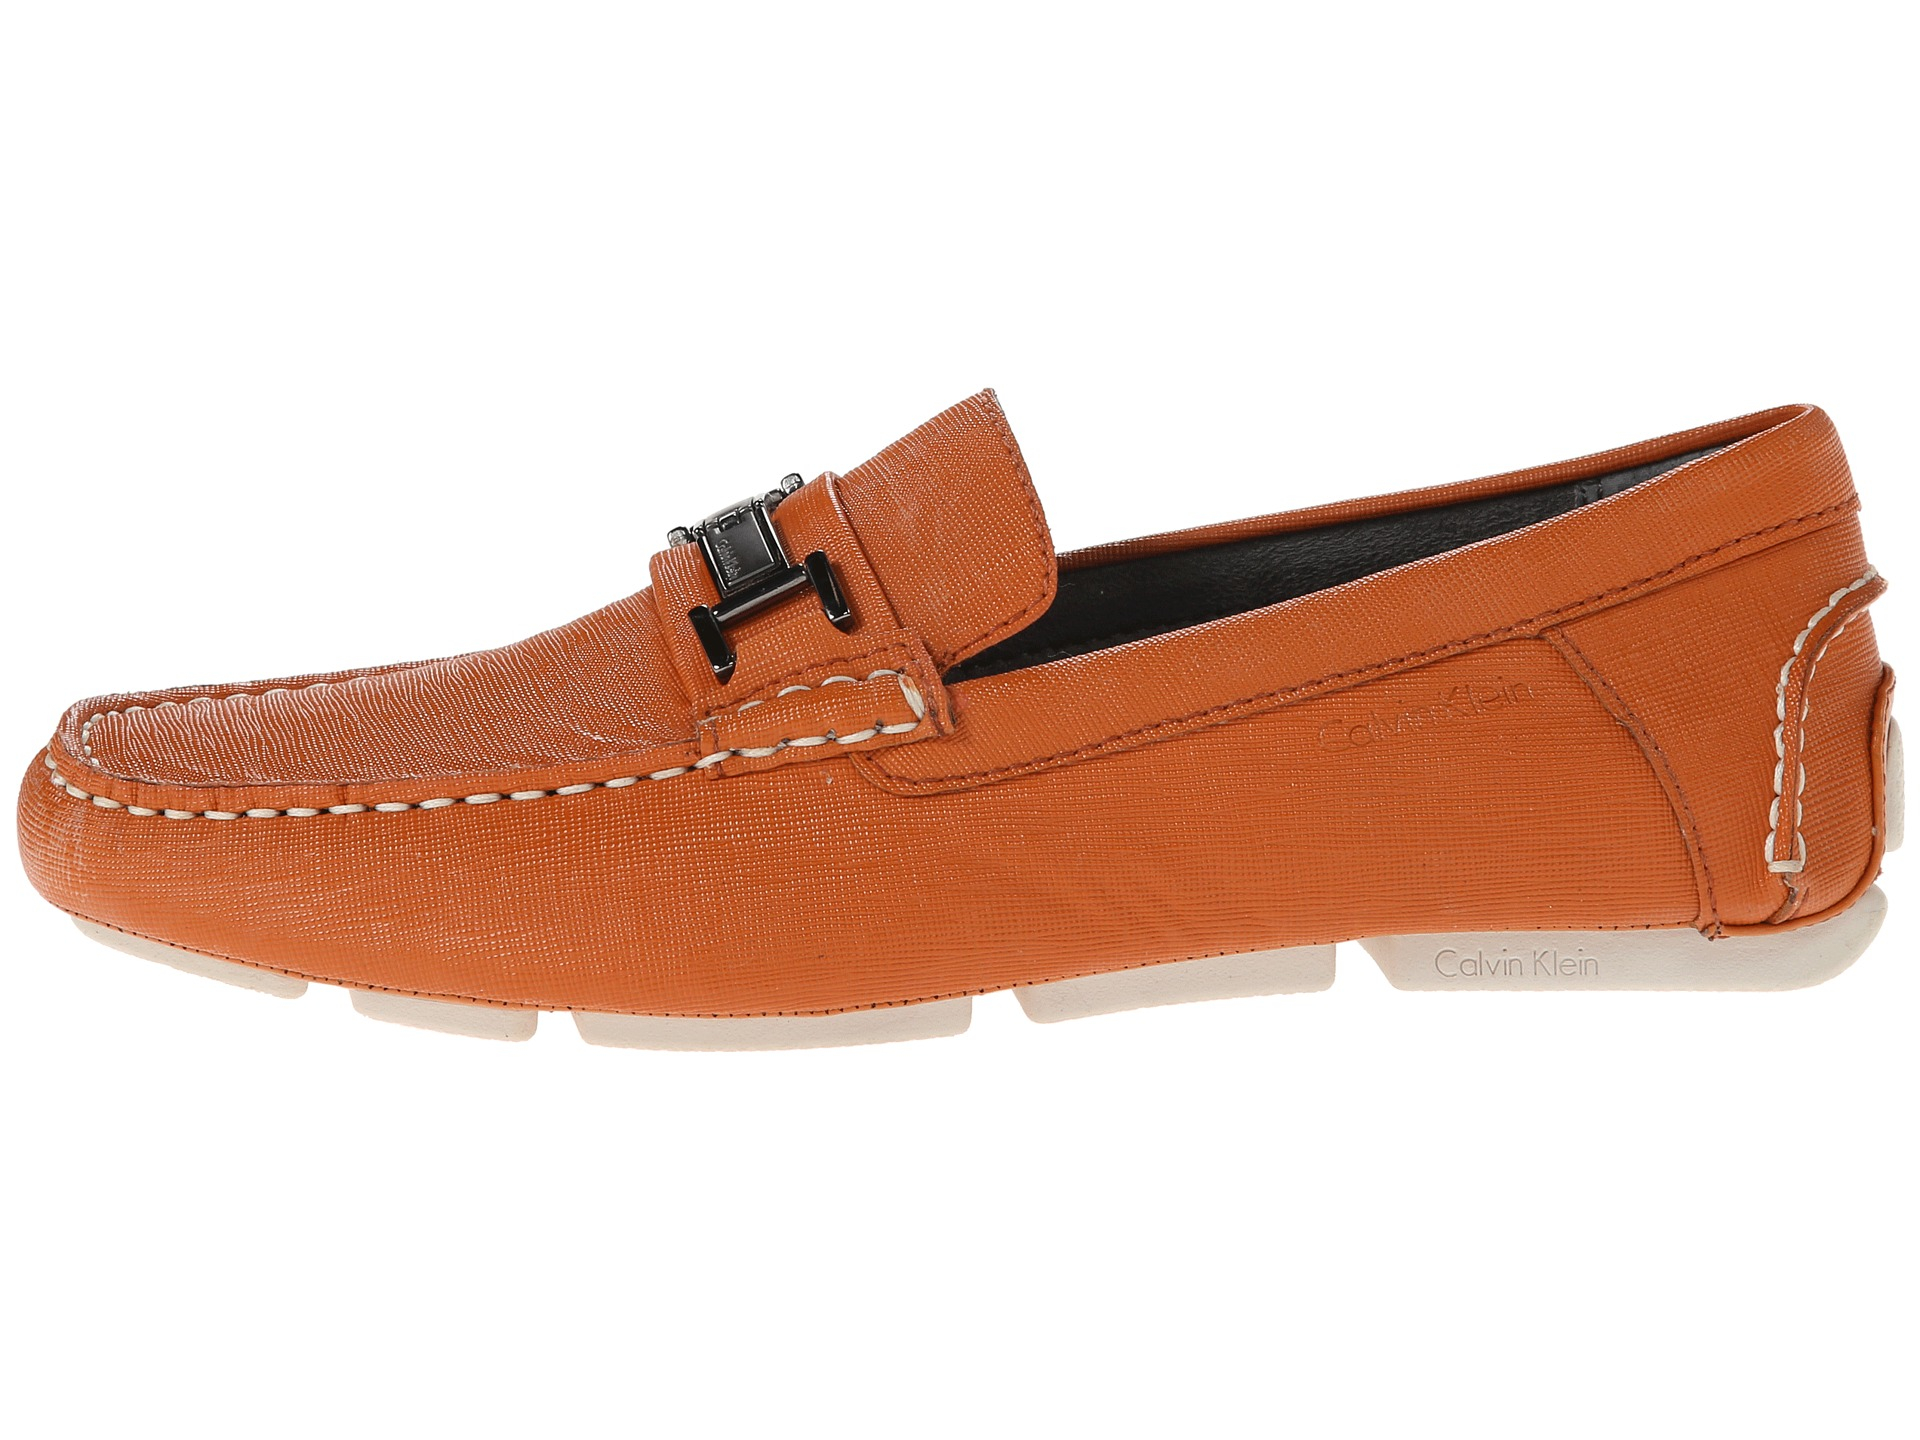 867aa00654f Lyst - Calvin Klein Magnus in Orange for Men